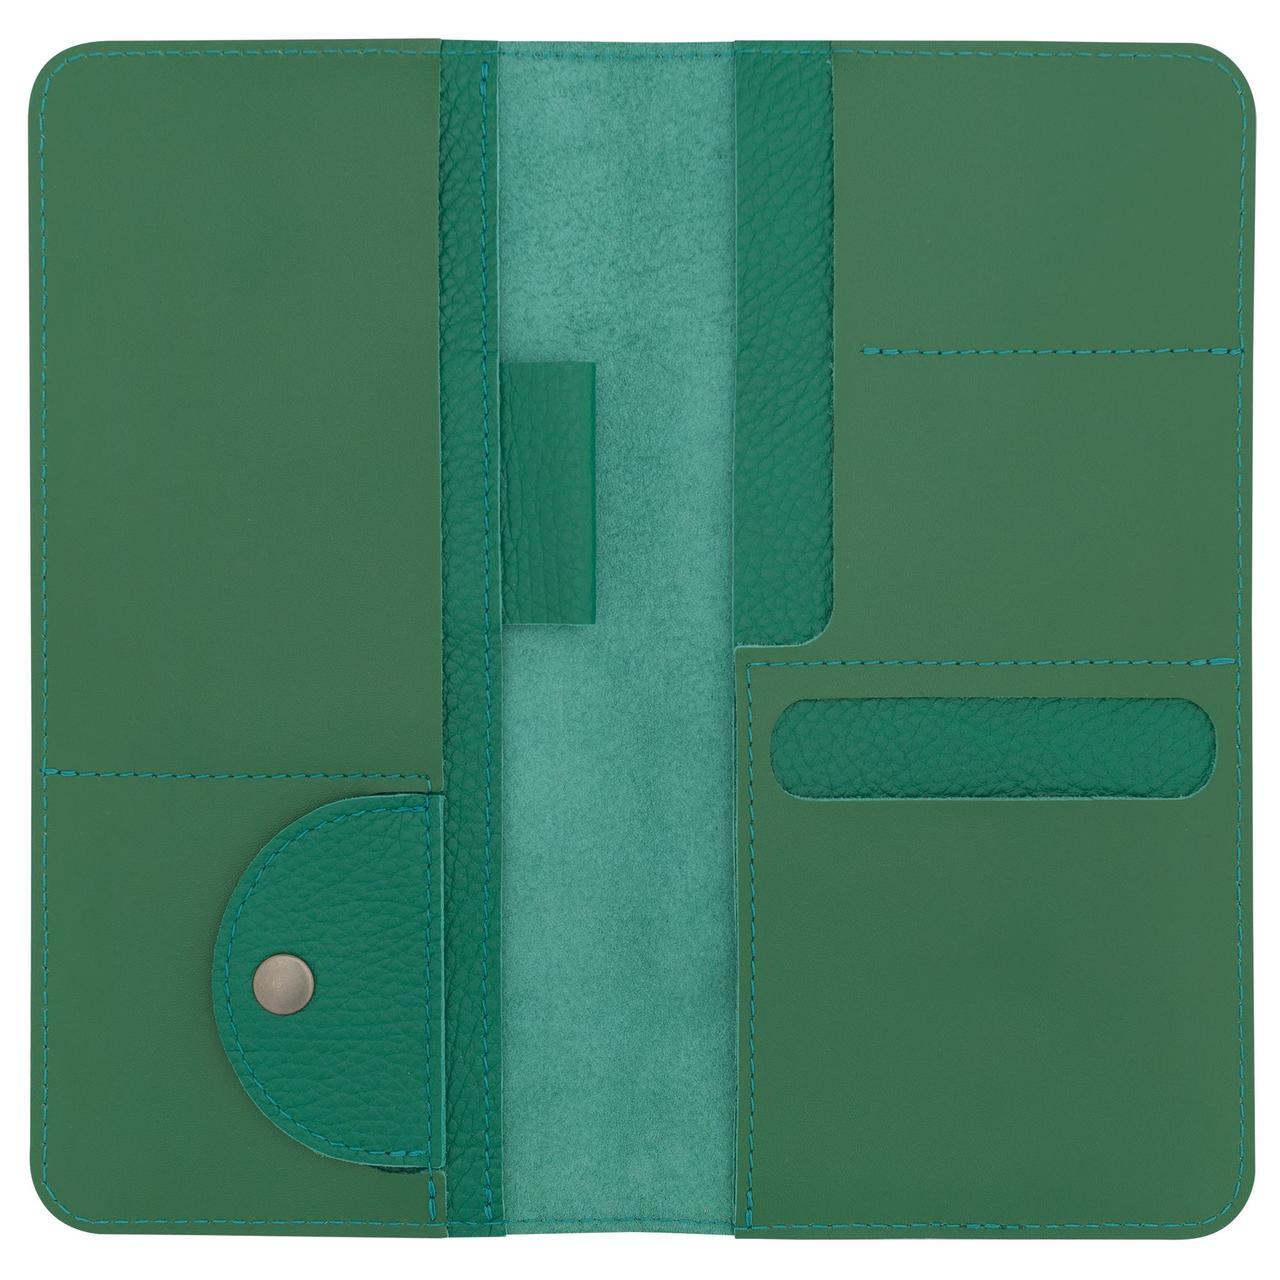 Органайзер для путешествий Hakuna Matata, зеленый